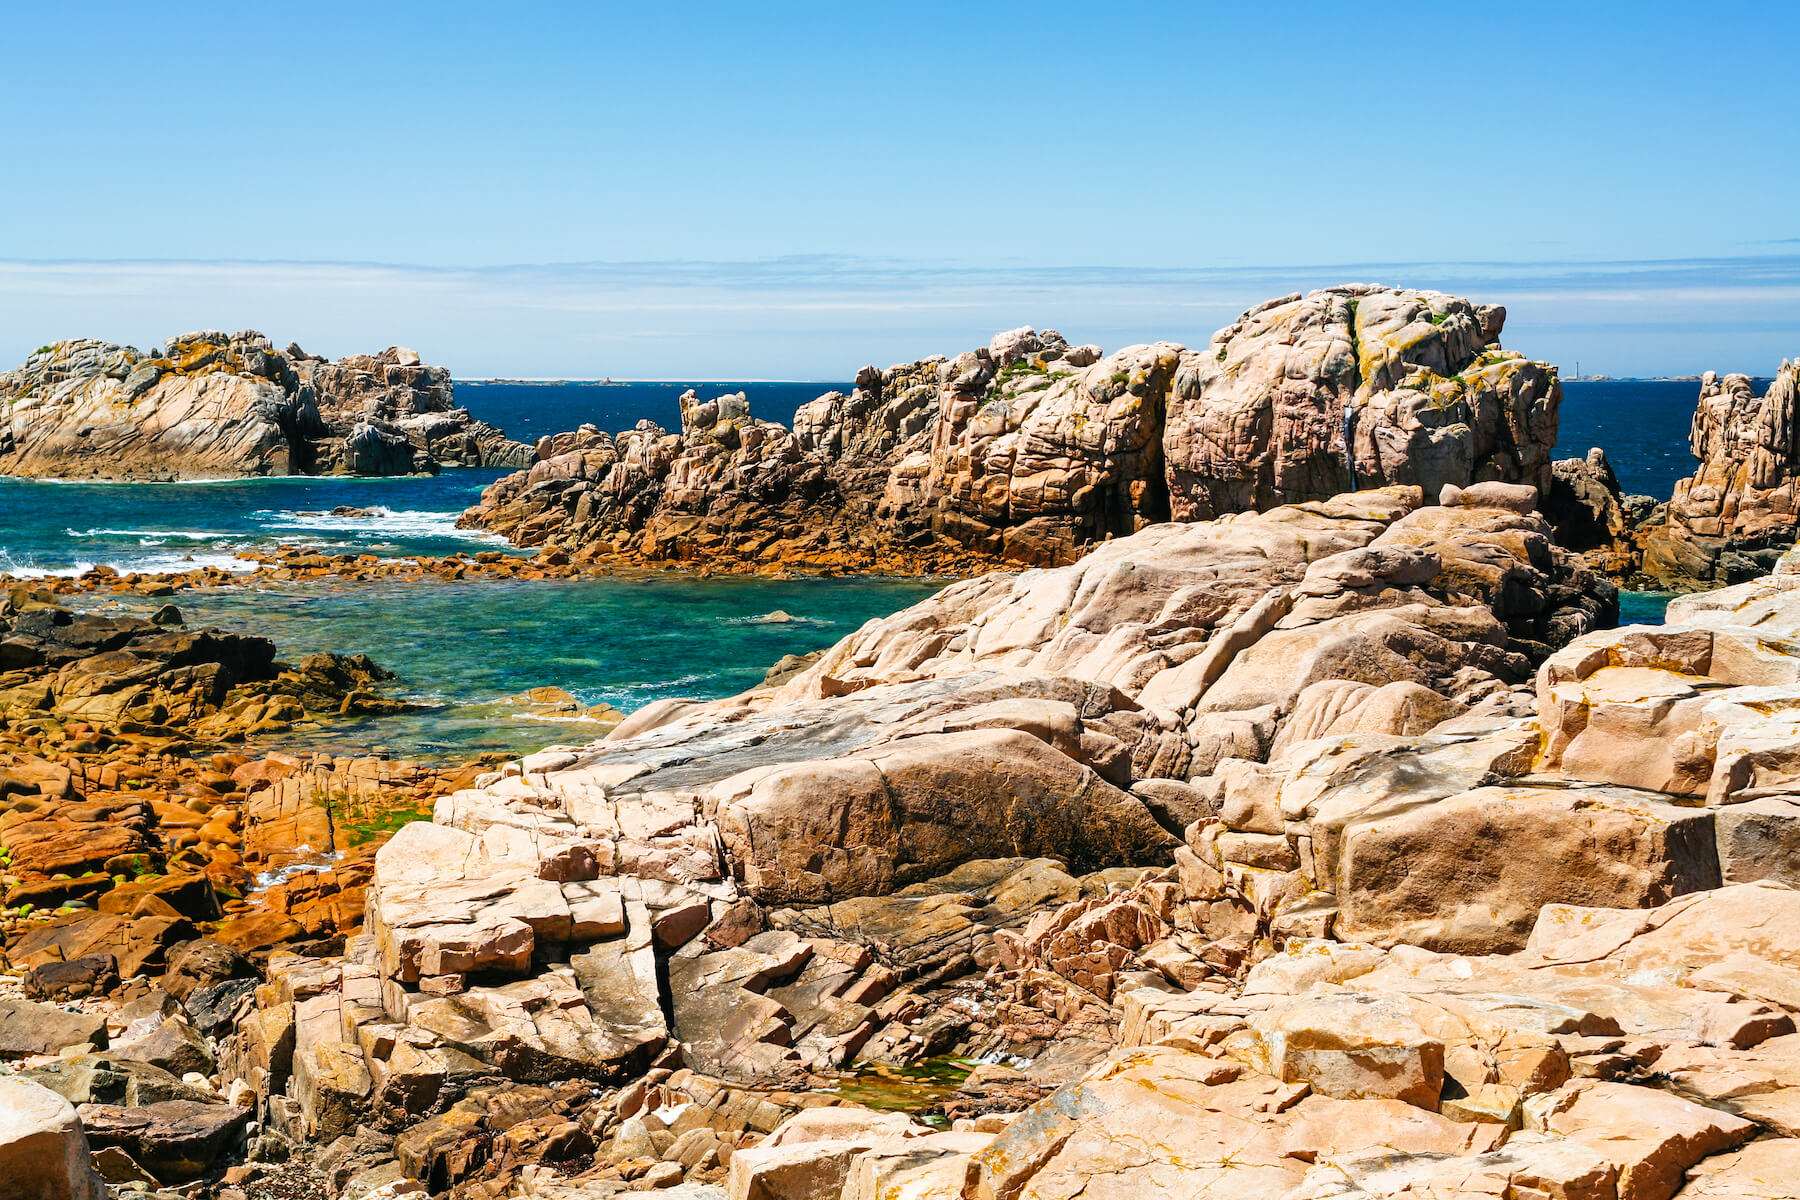 rocky-coasline-of-ile-de-brehat-island-PDDMK9L